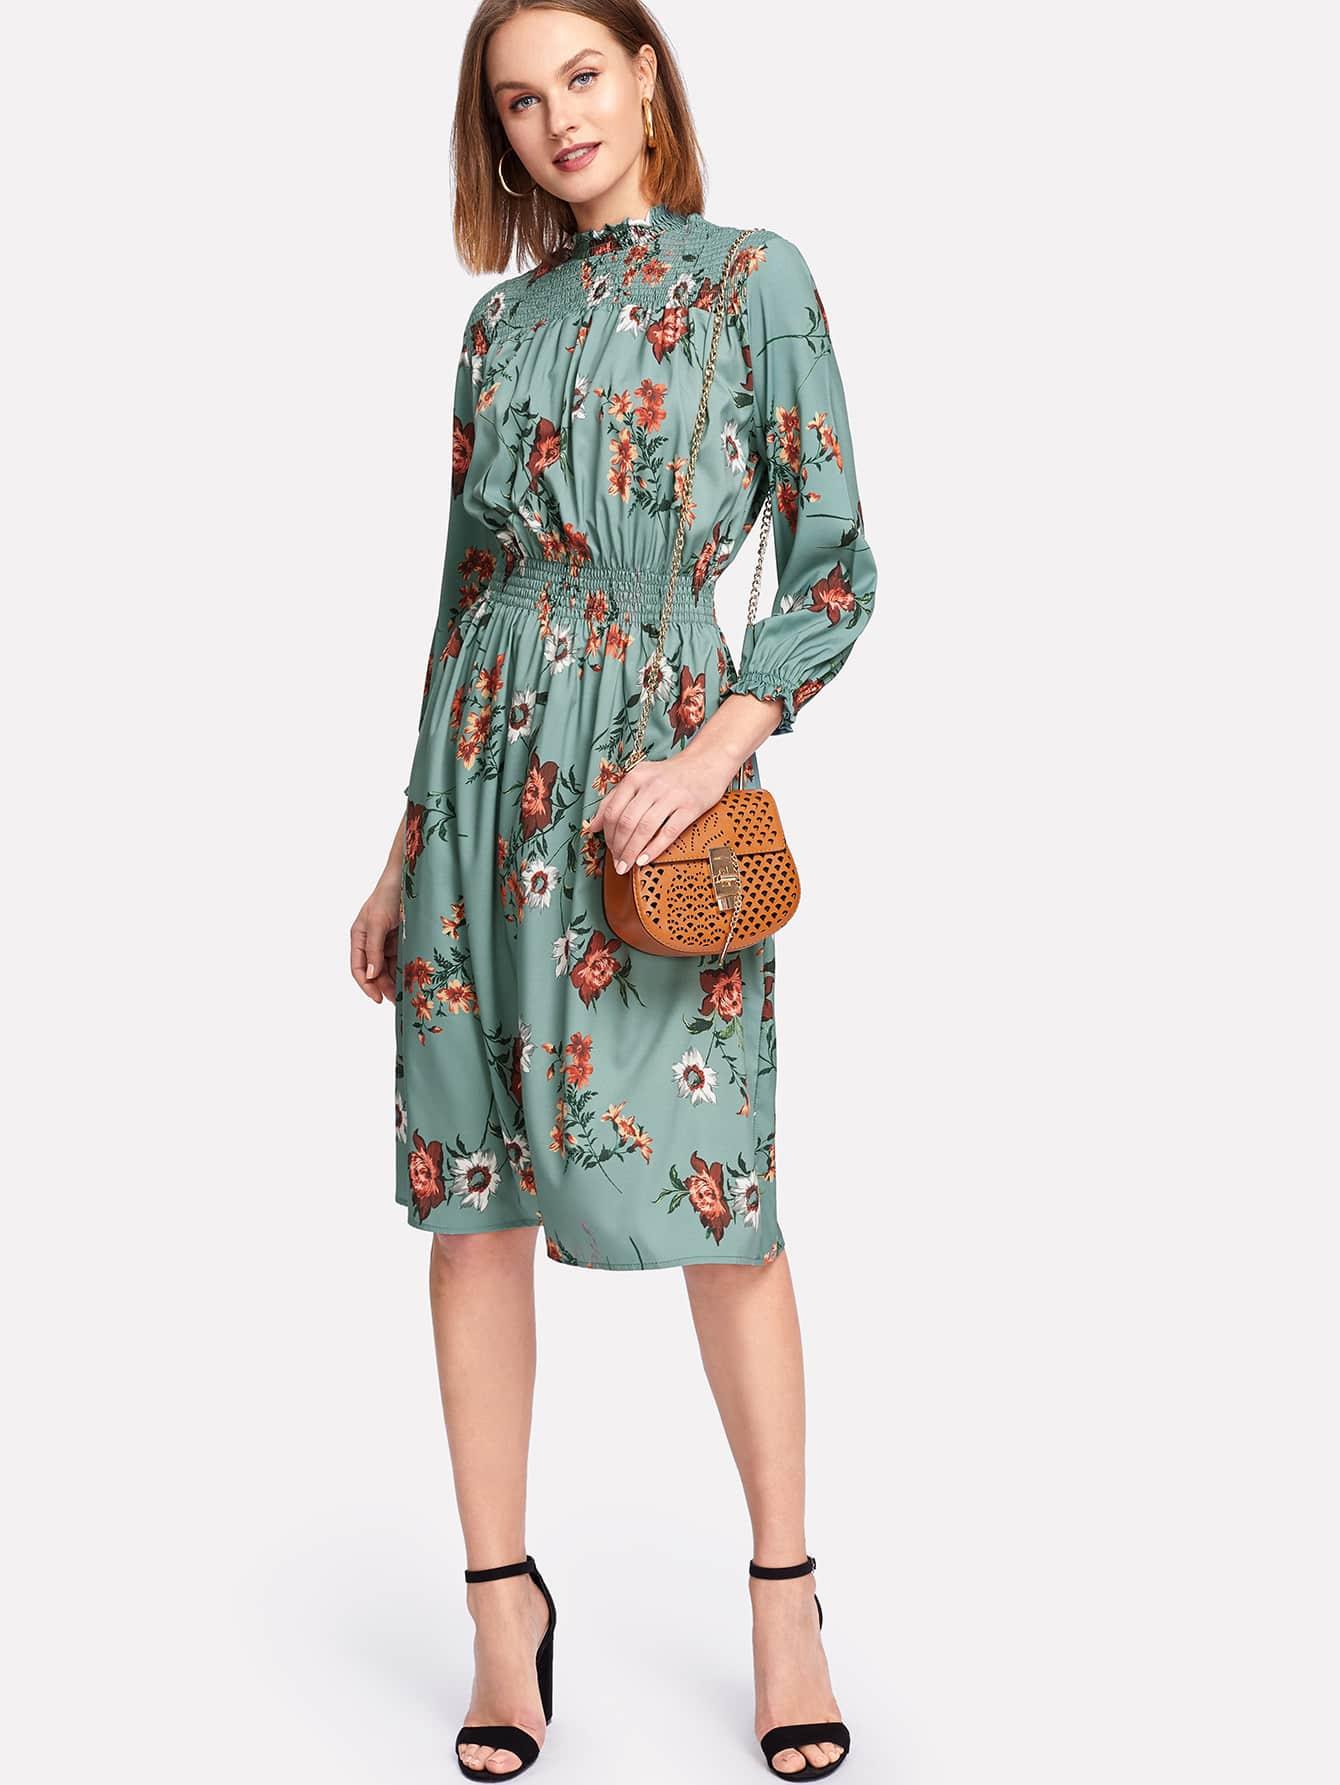 Shirred Detail Floral Dress джеймс эшер bhakta ranga rasa india новый взгляд mp3